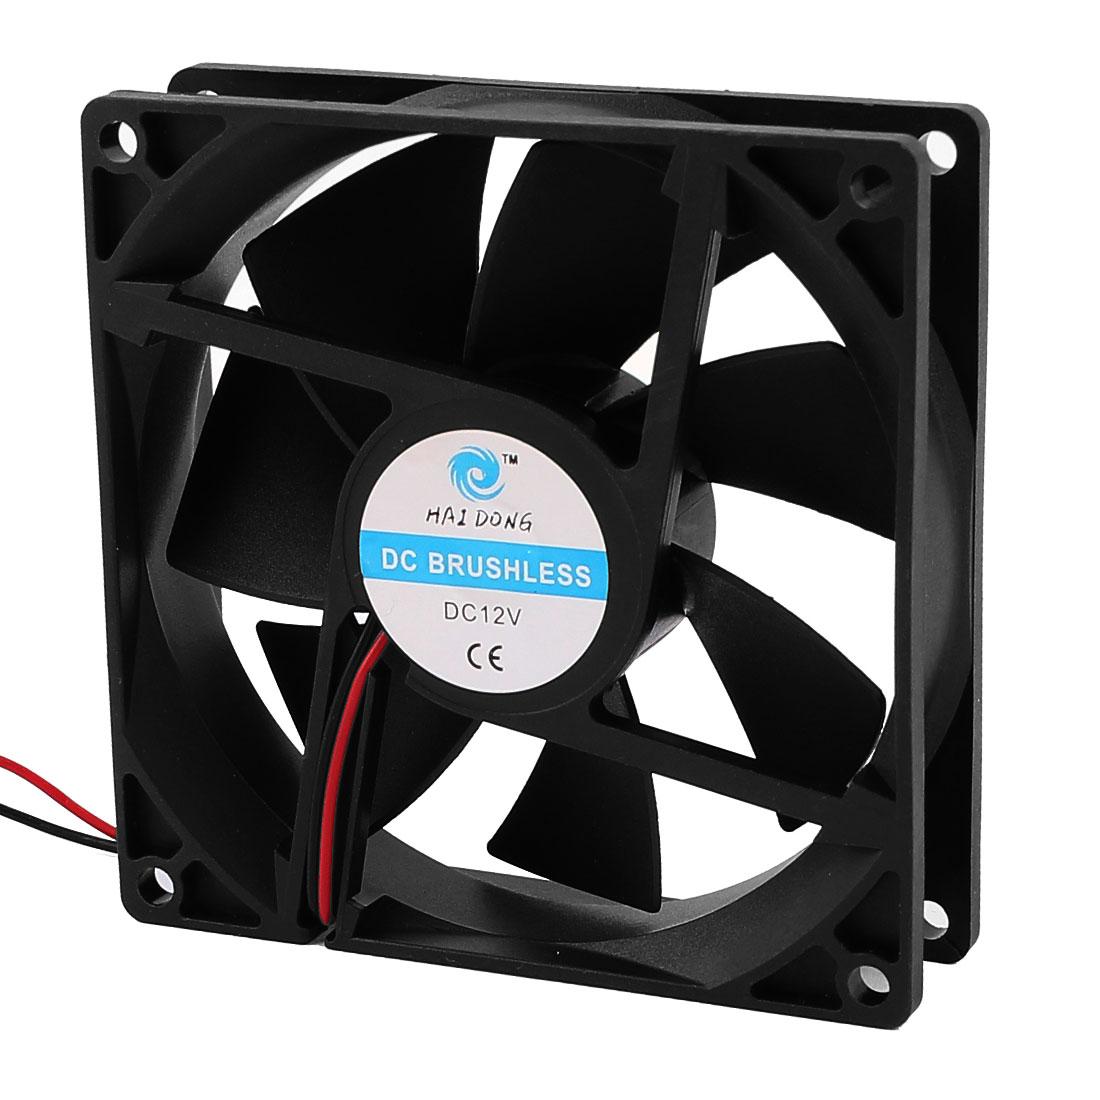 PC Computer Desktop CPU Cooler Cooling Fan 2 Terminals Connector